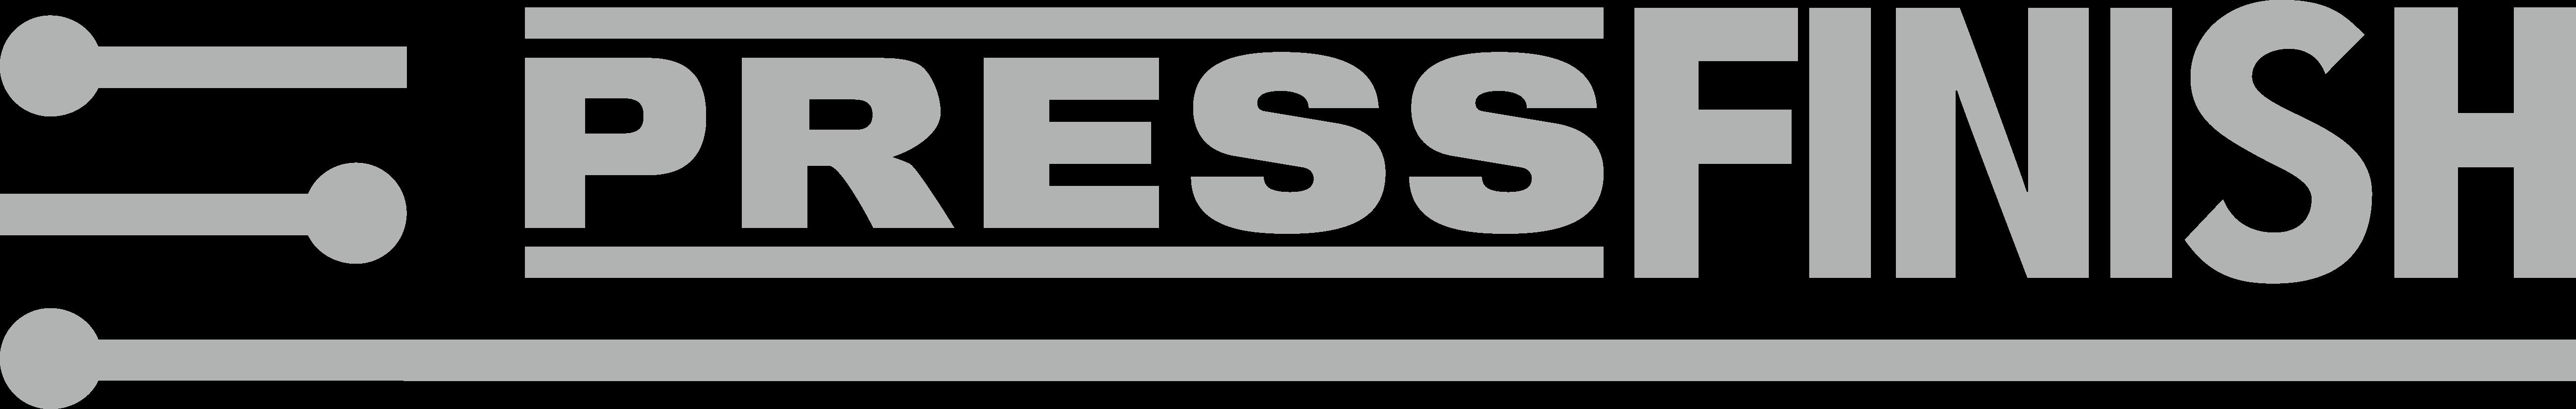 PressFinish - Elektronik-Gruppe der STEMAS AG